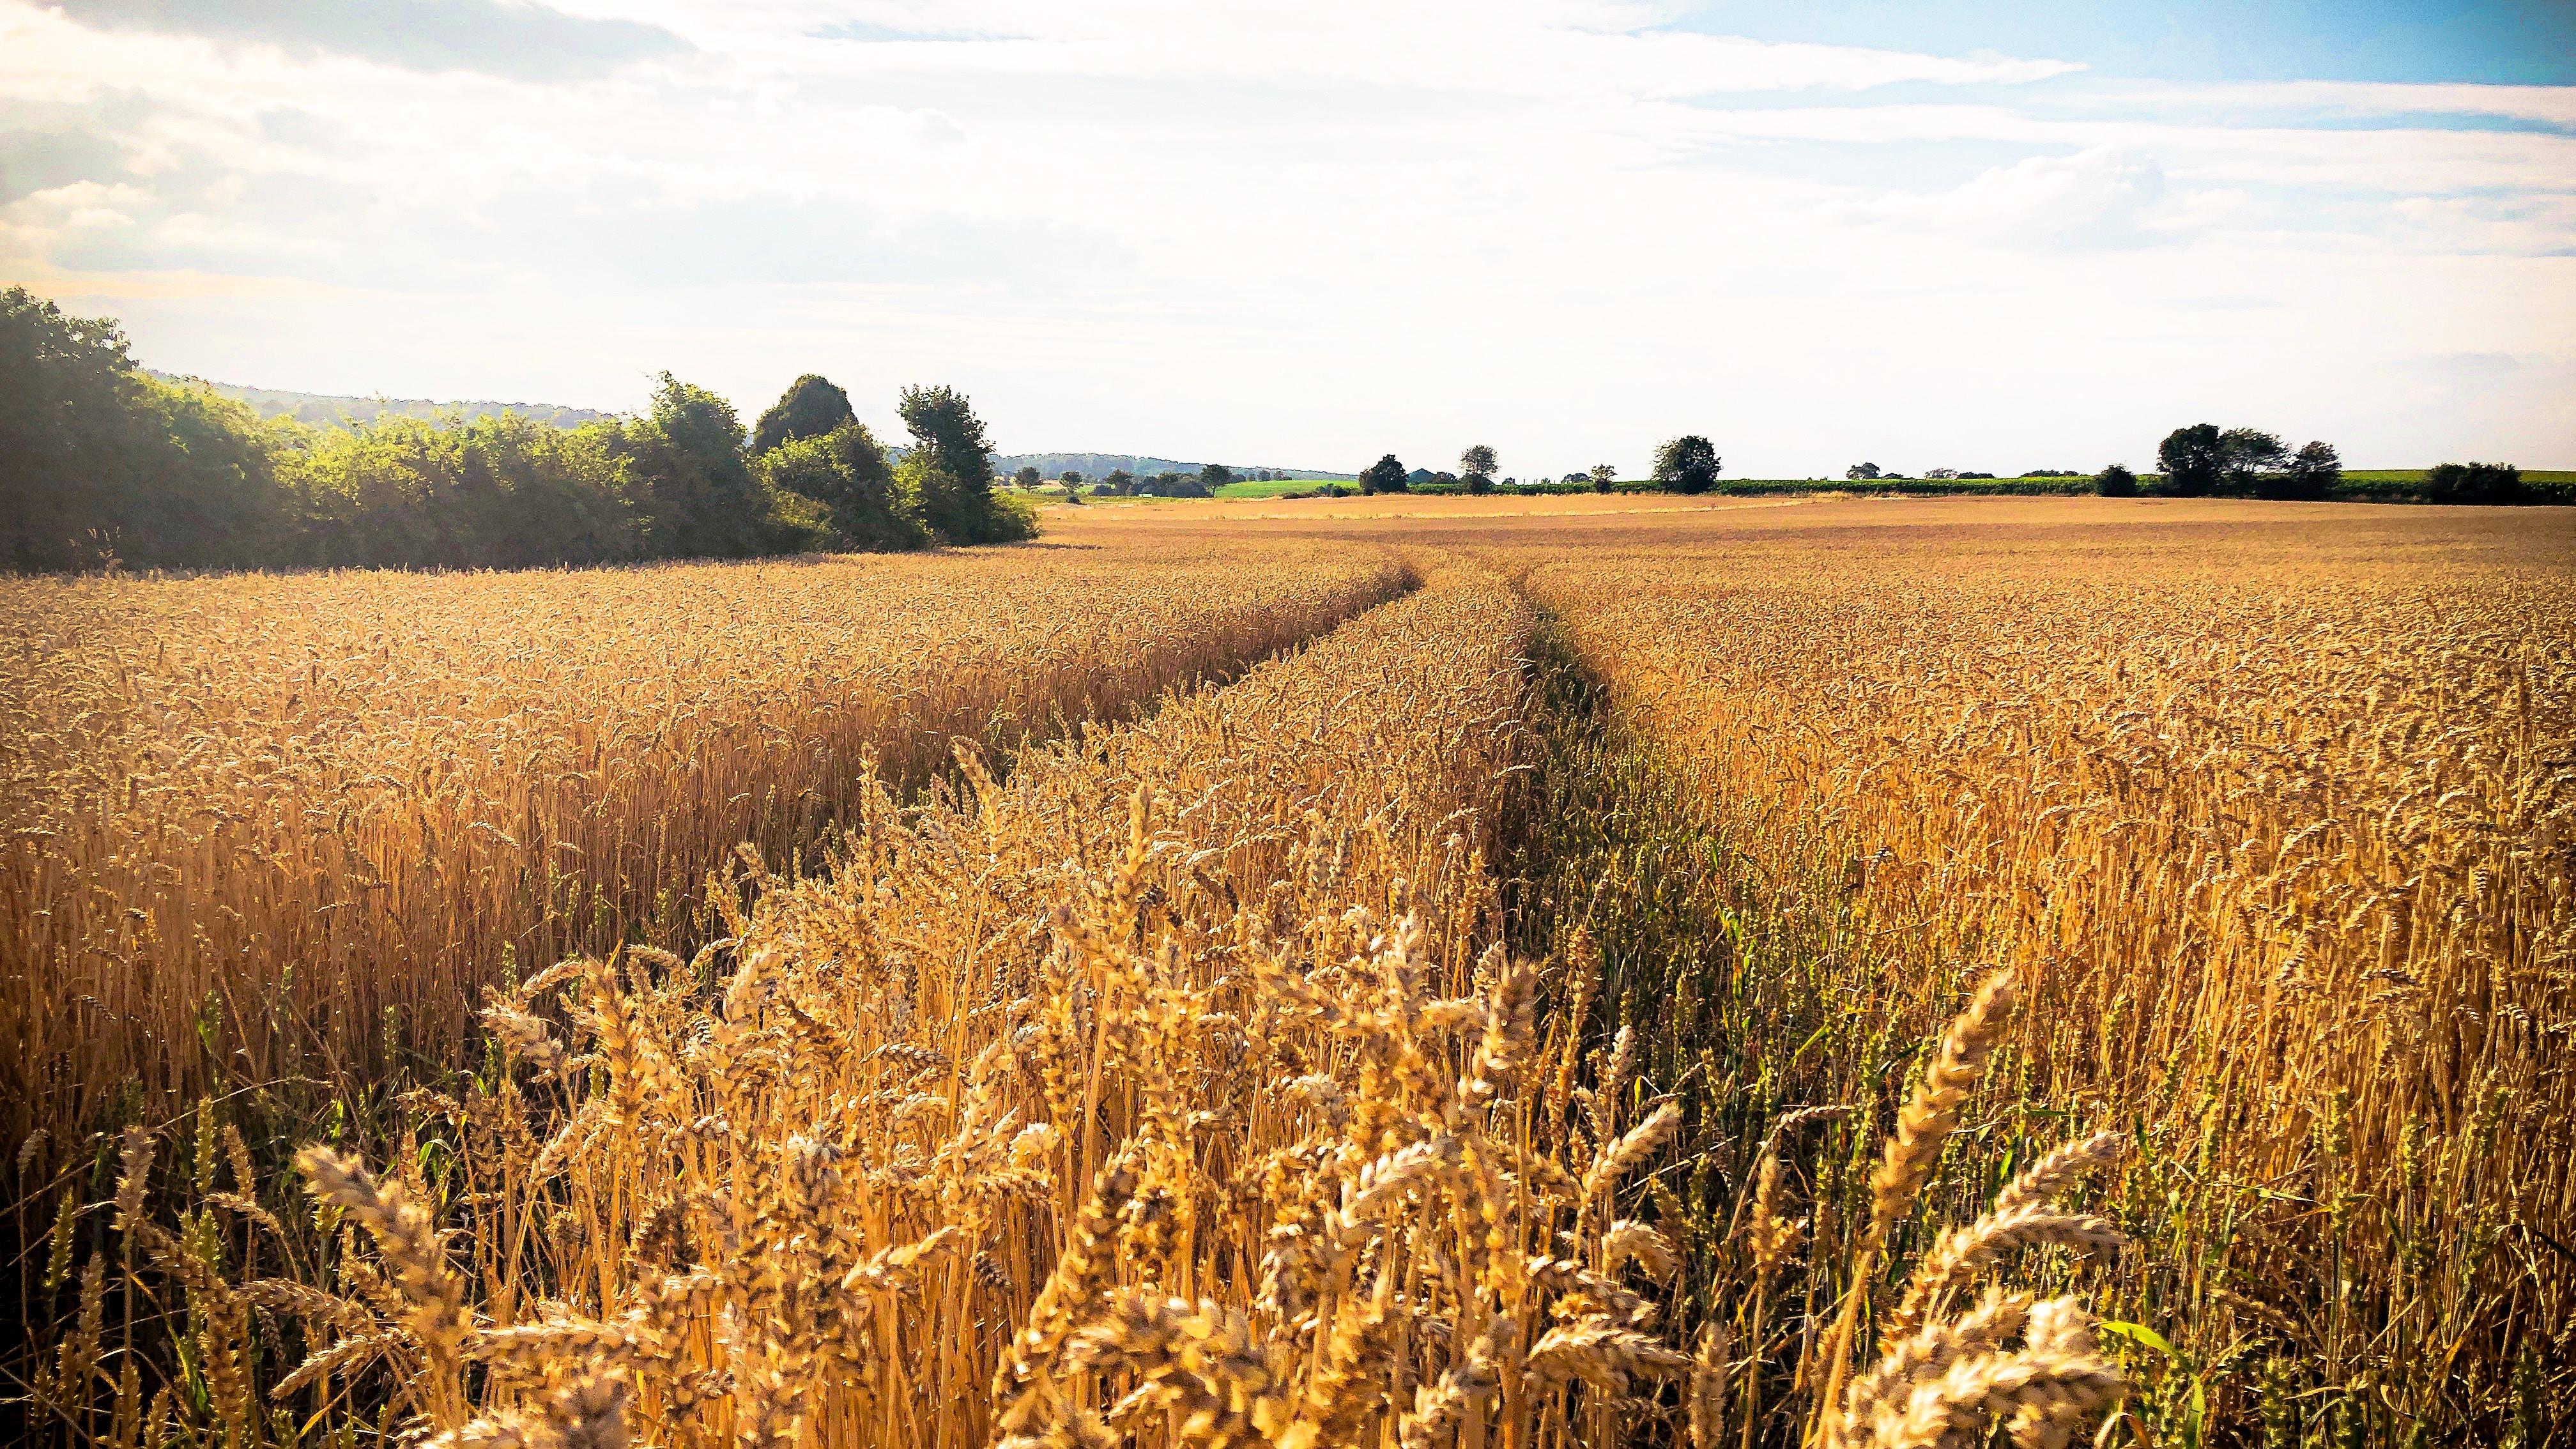 brown wheat field under white clouds during daytime